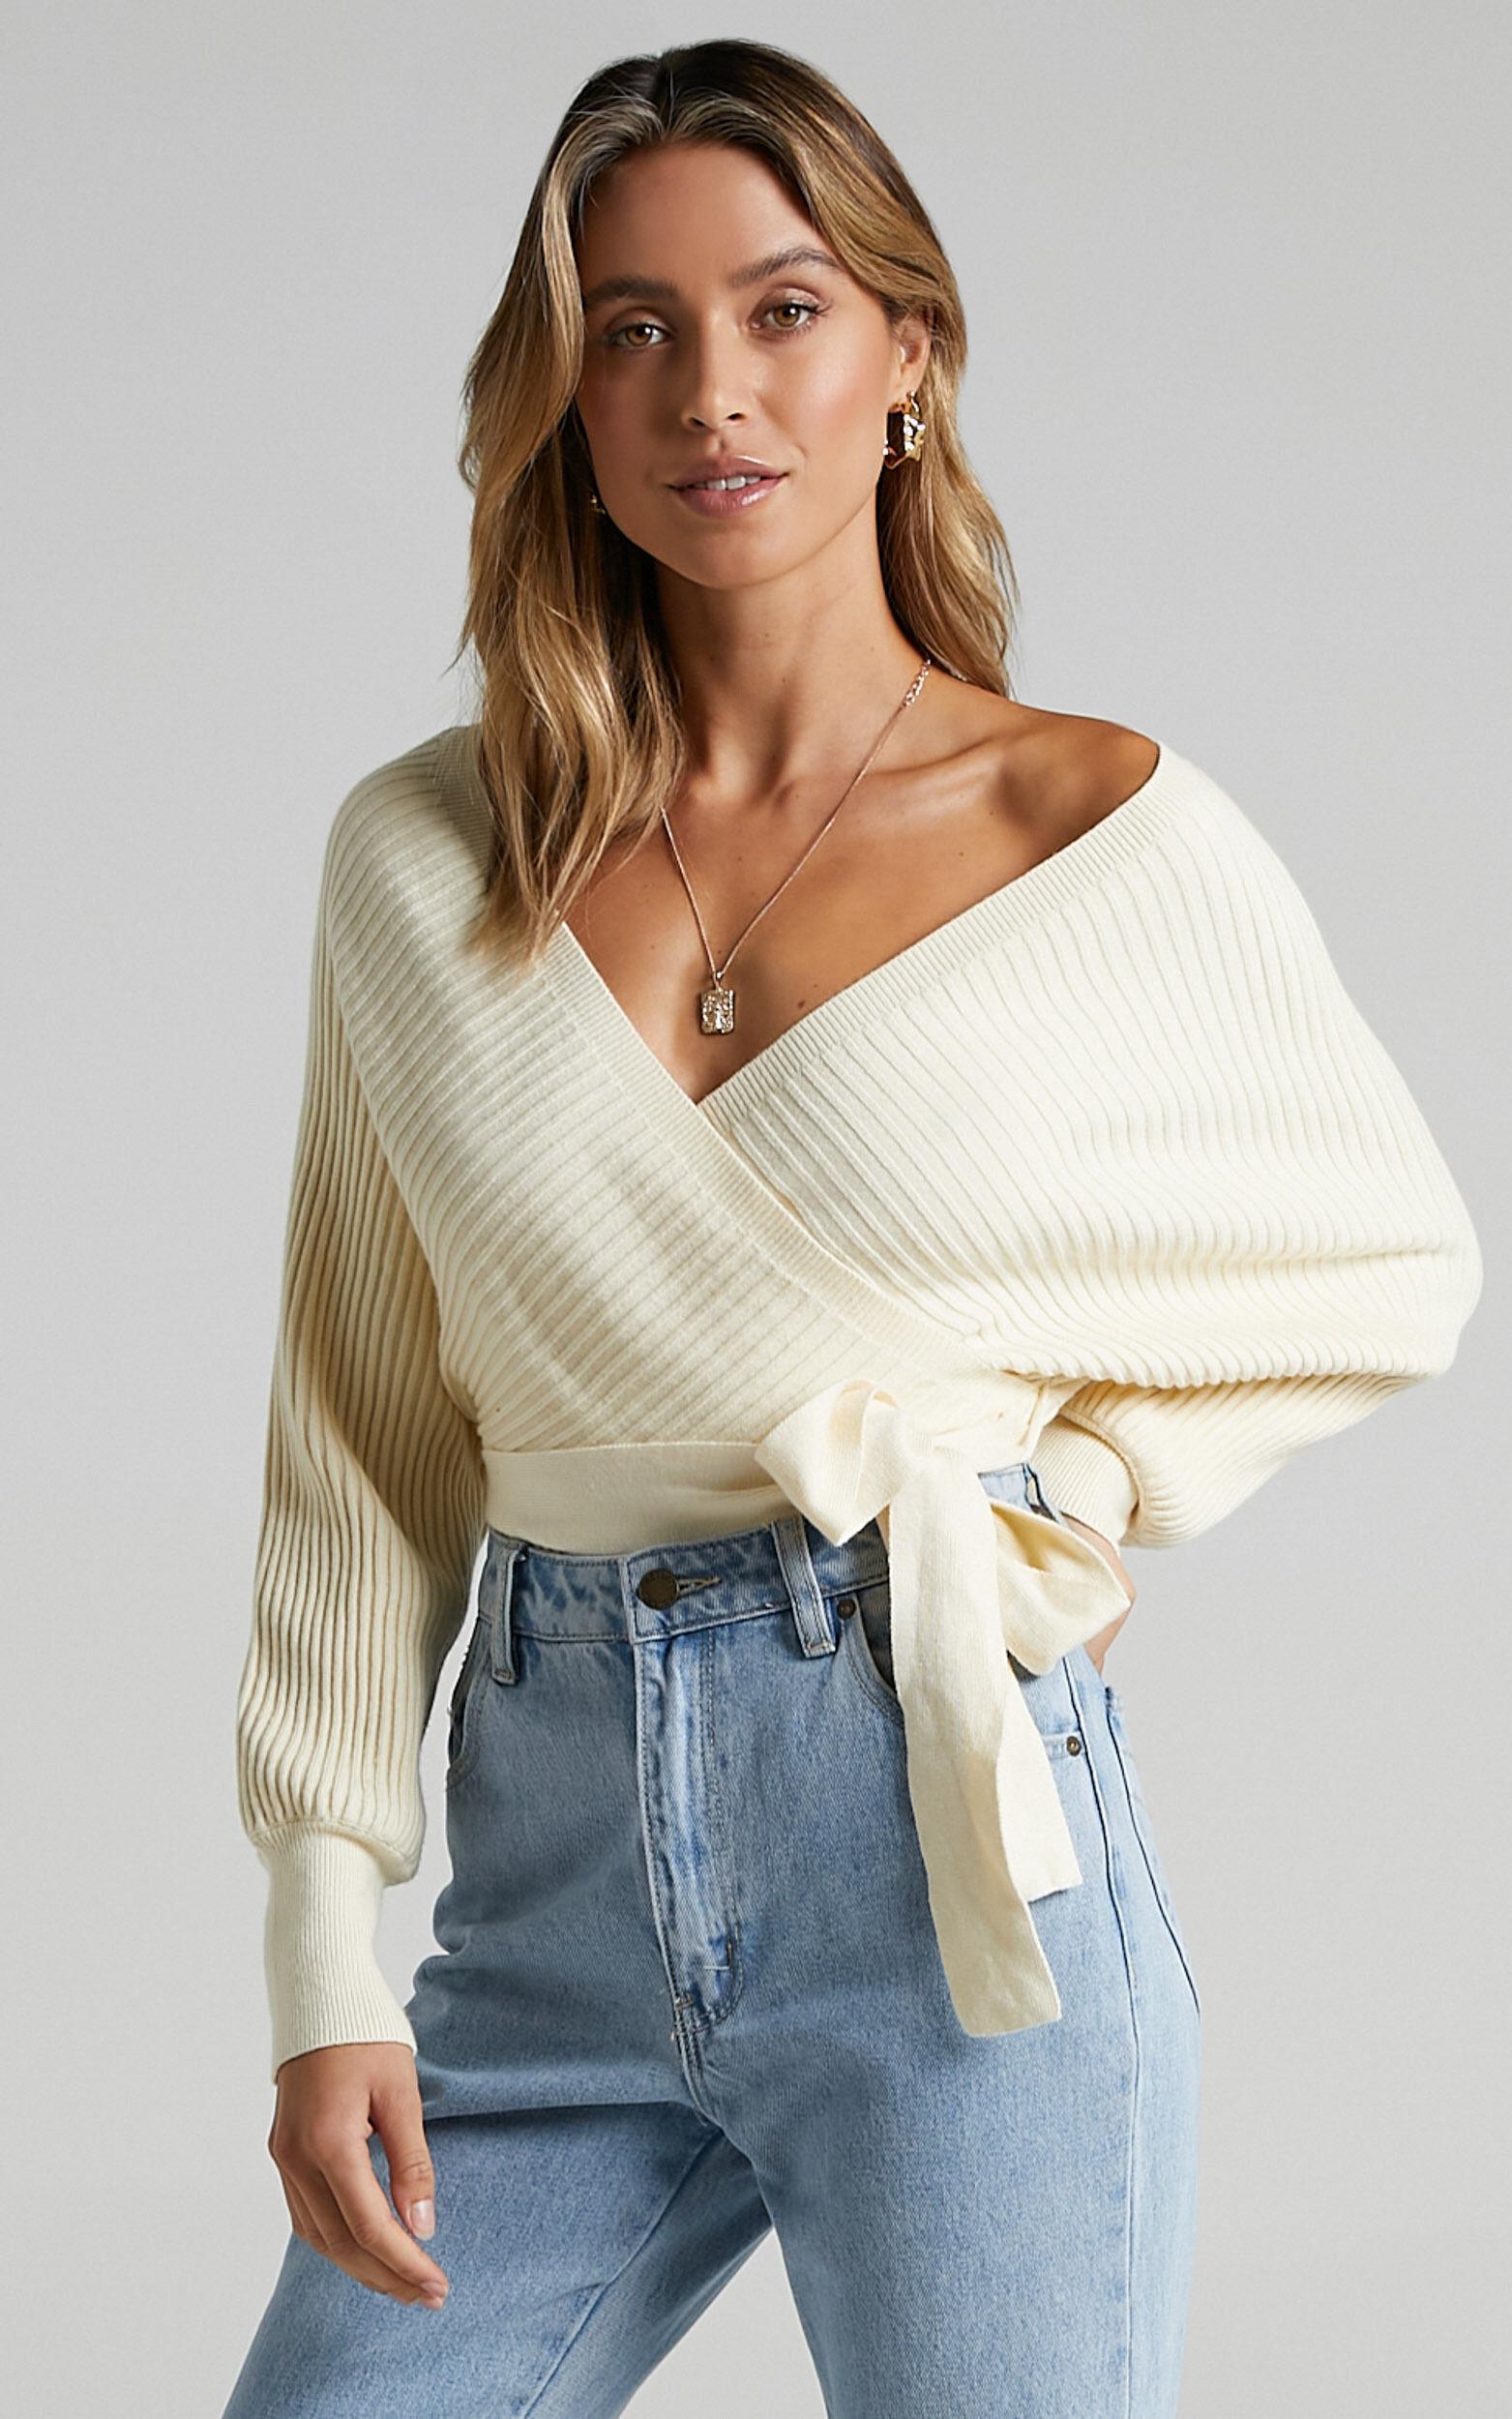 Camry Knit Bodysuit in Cream - 04, CRE2, super-hi-res image number null